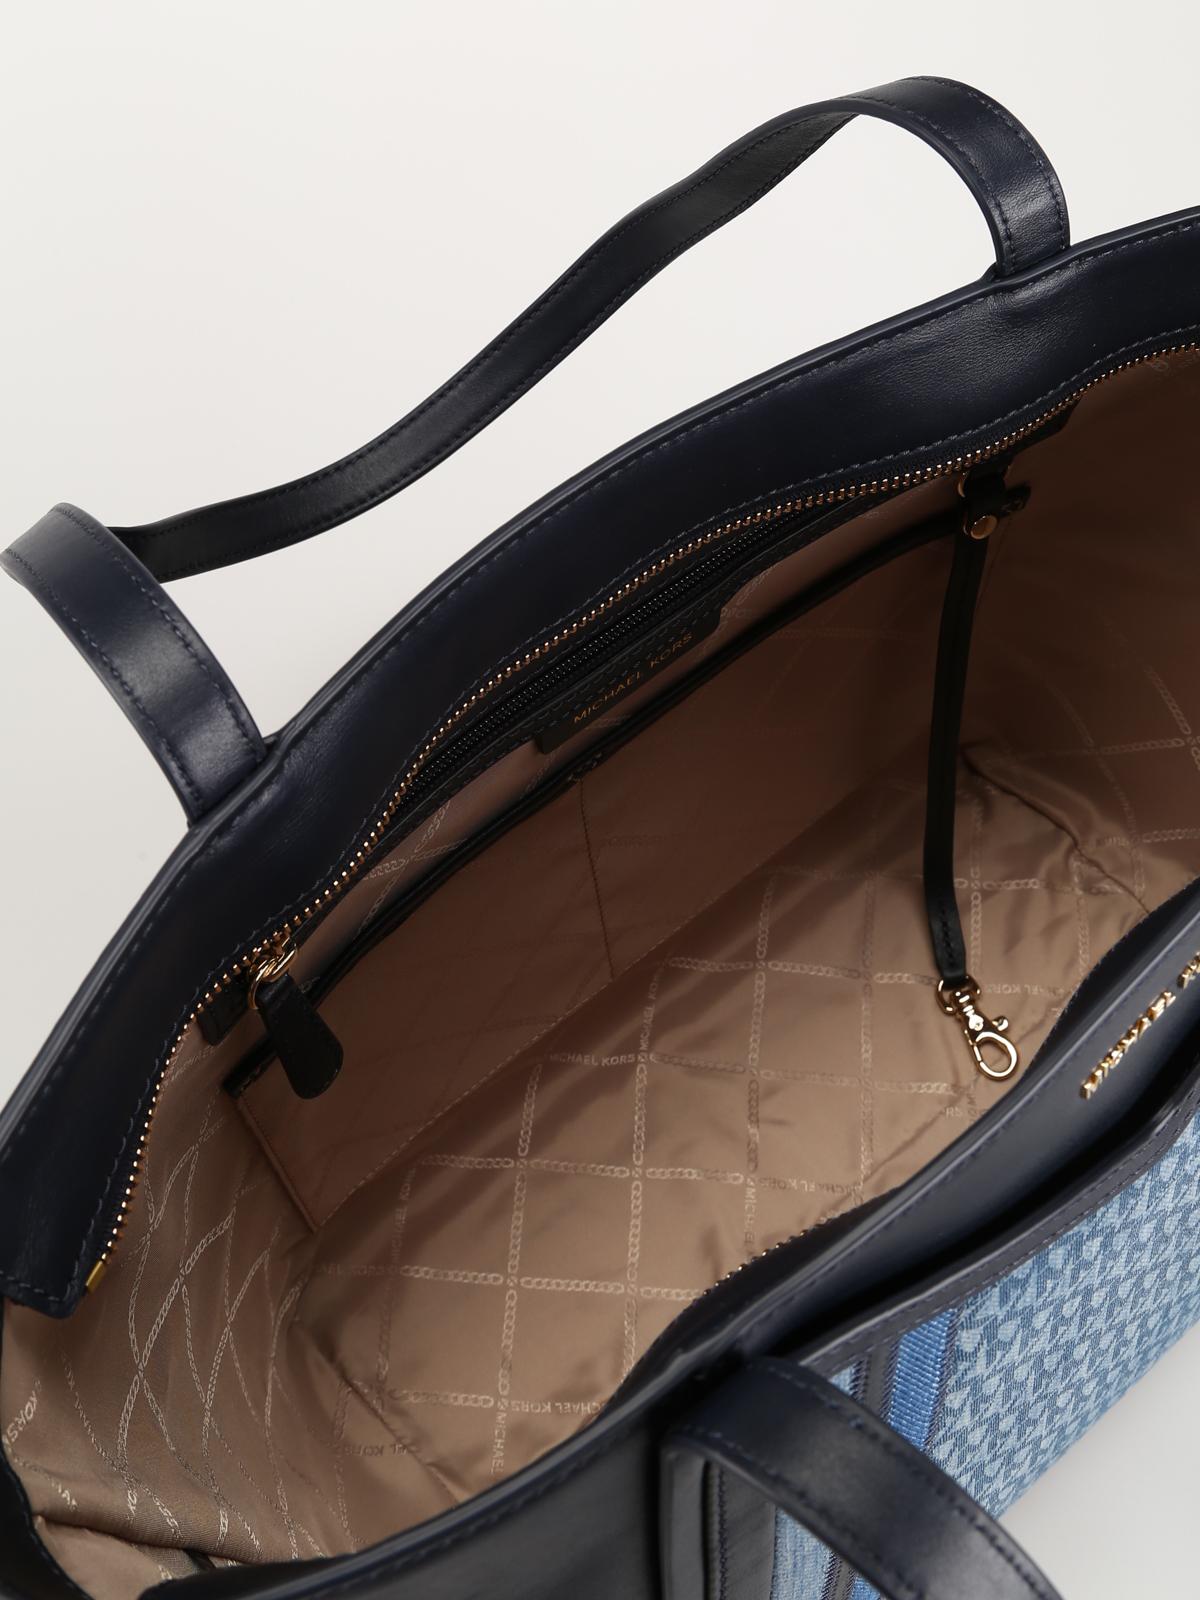 e895b1633d2e MICHAEL KORS buy online Whitney leather and denim large tote. MICHAEL KORS: totes  bags ...